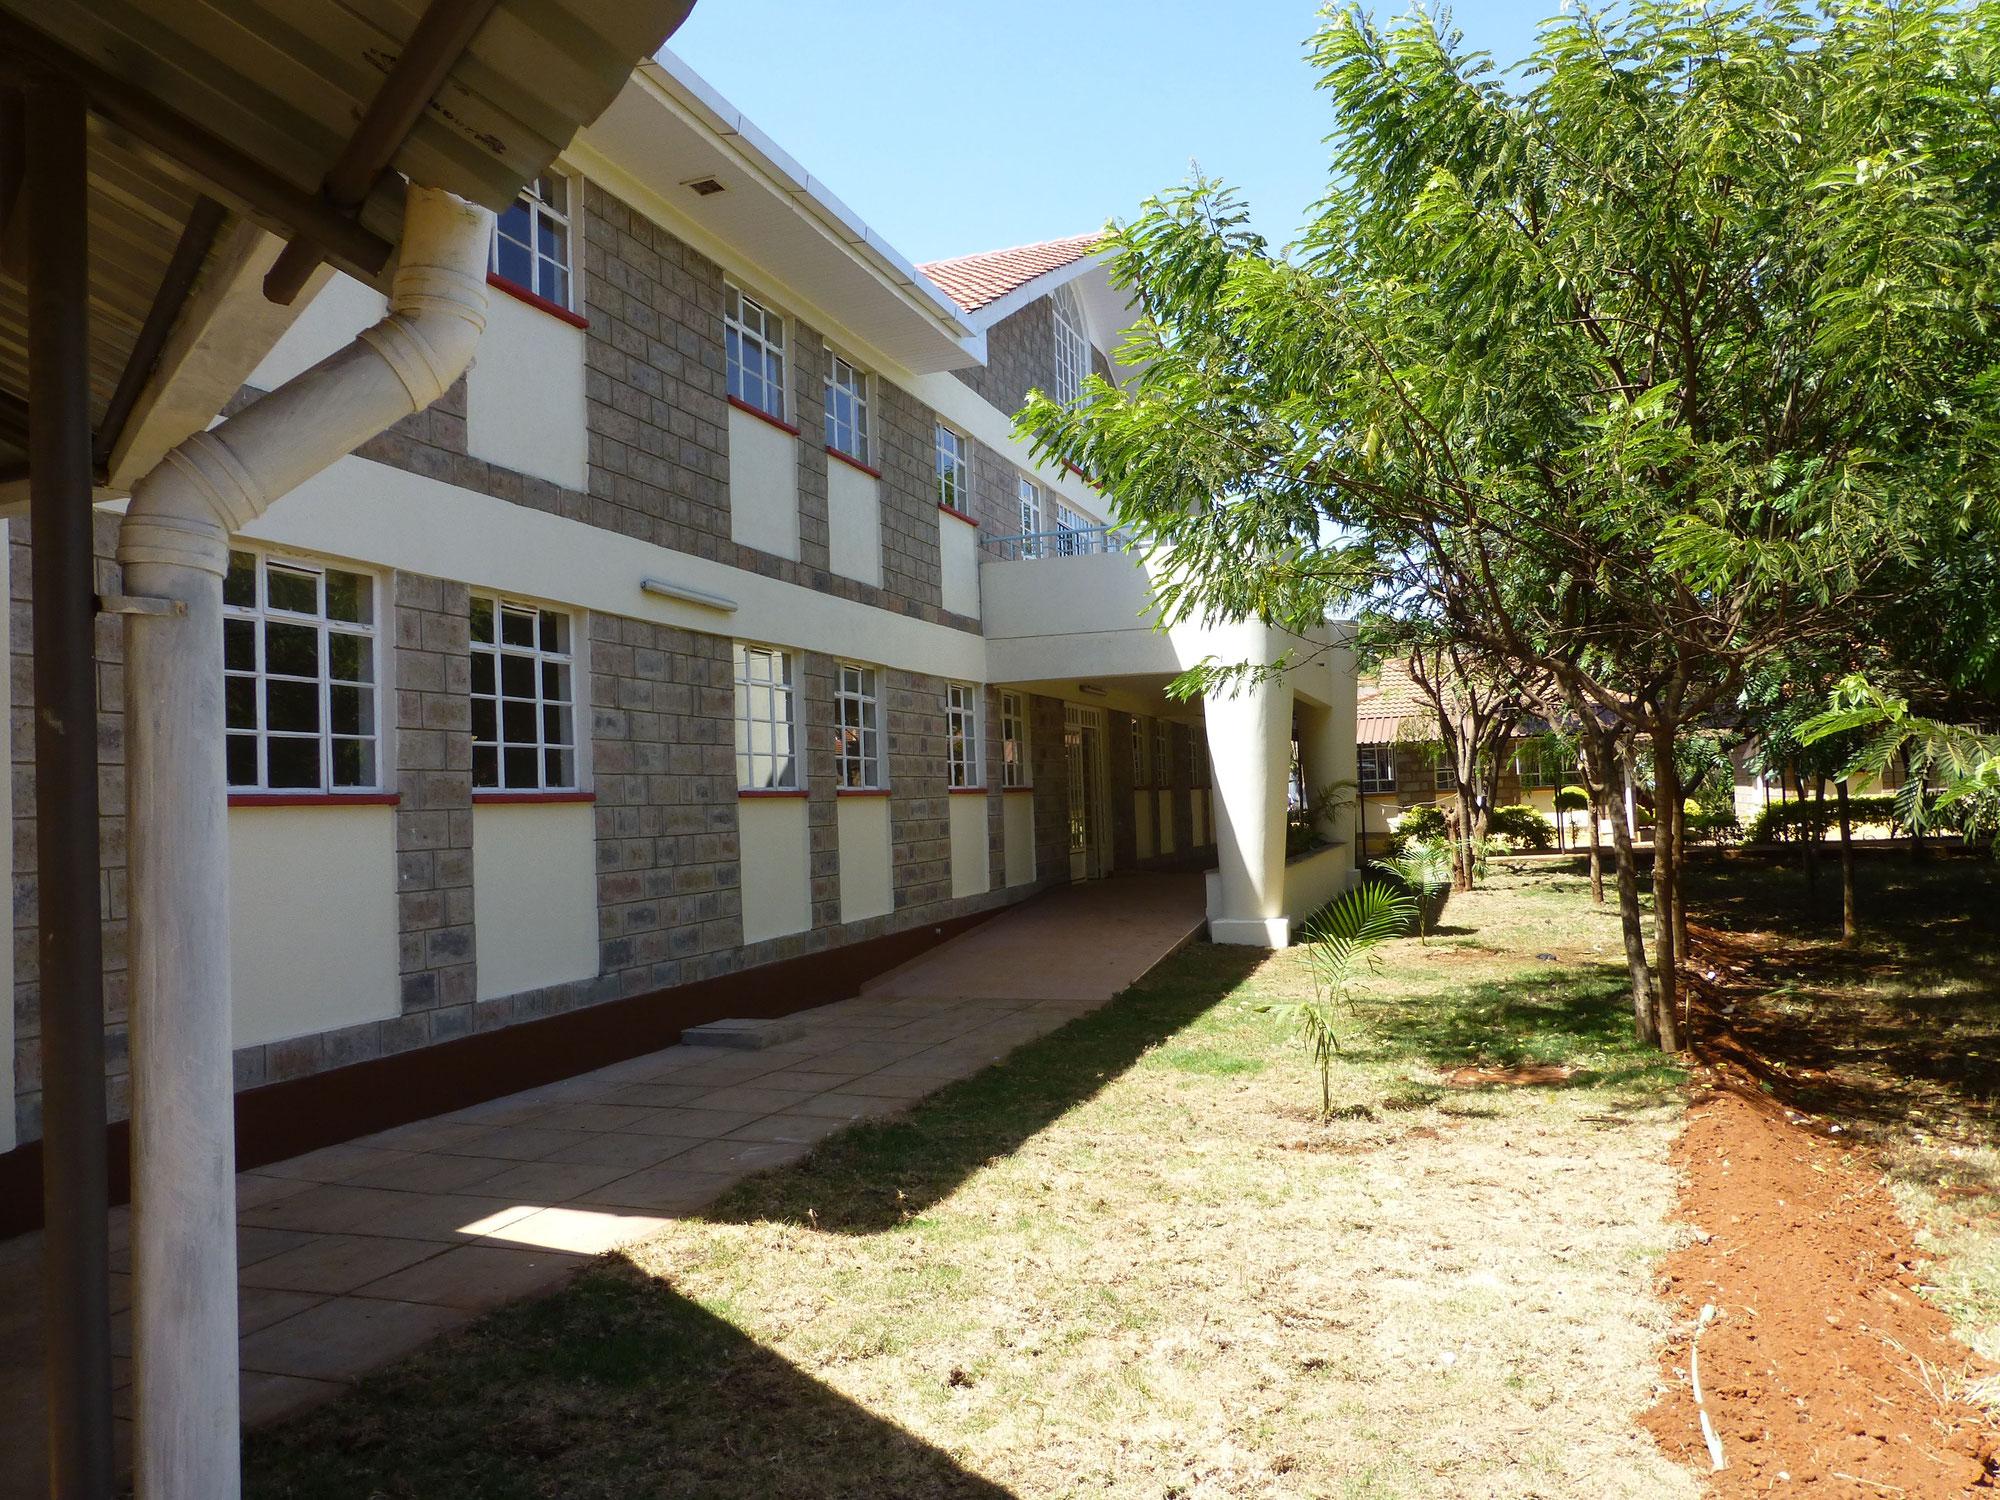 SOS – St. Matia Mulumba Mission Hospital braucht dringend Corona-Schutzausrüstung